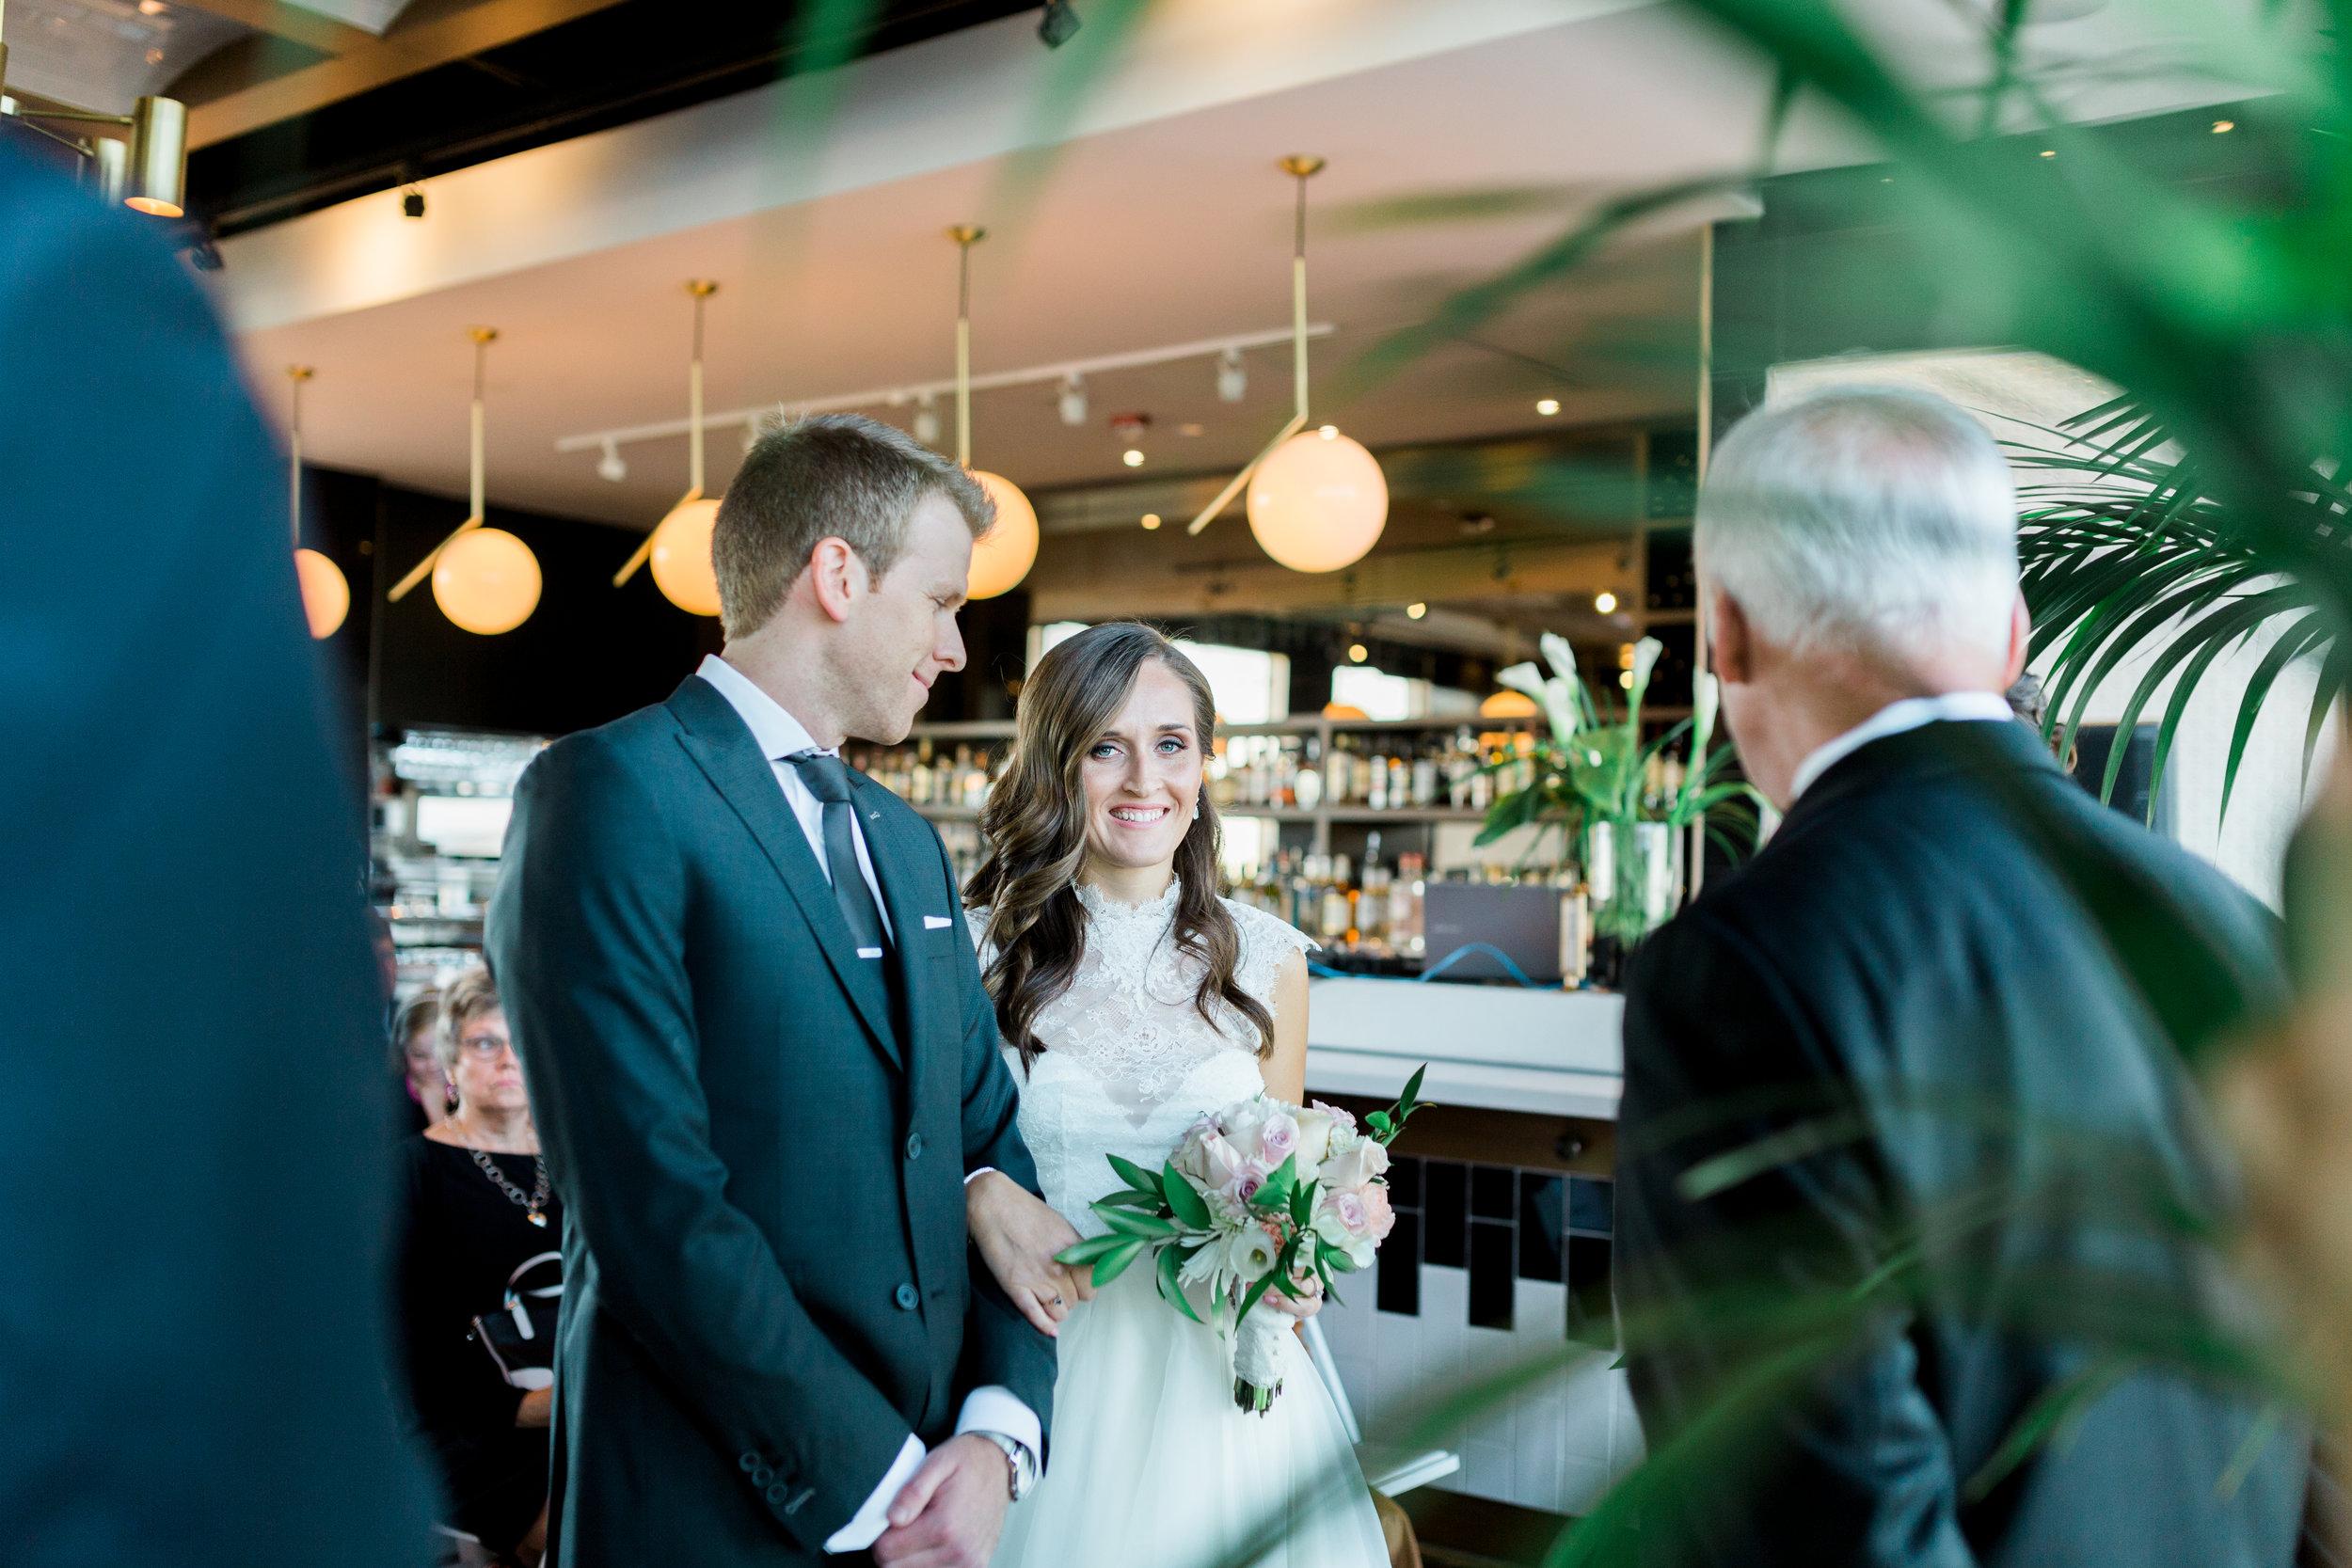 Toronto Fine Art Photographer - 180 Restaurant Wedding - Ceremony-76.jpg